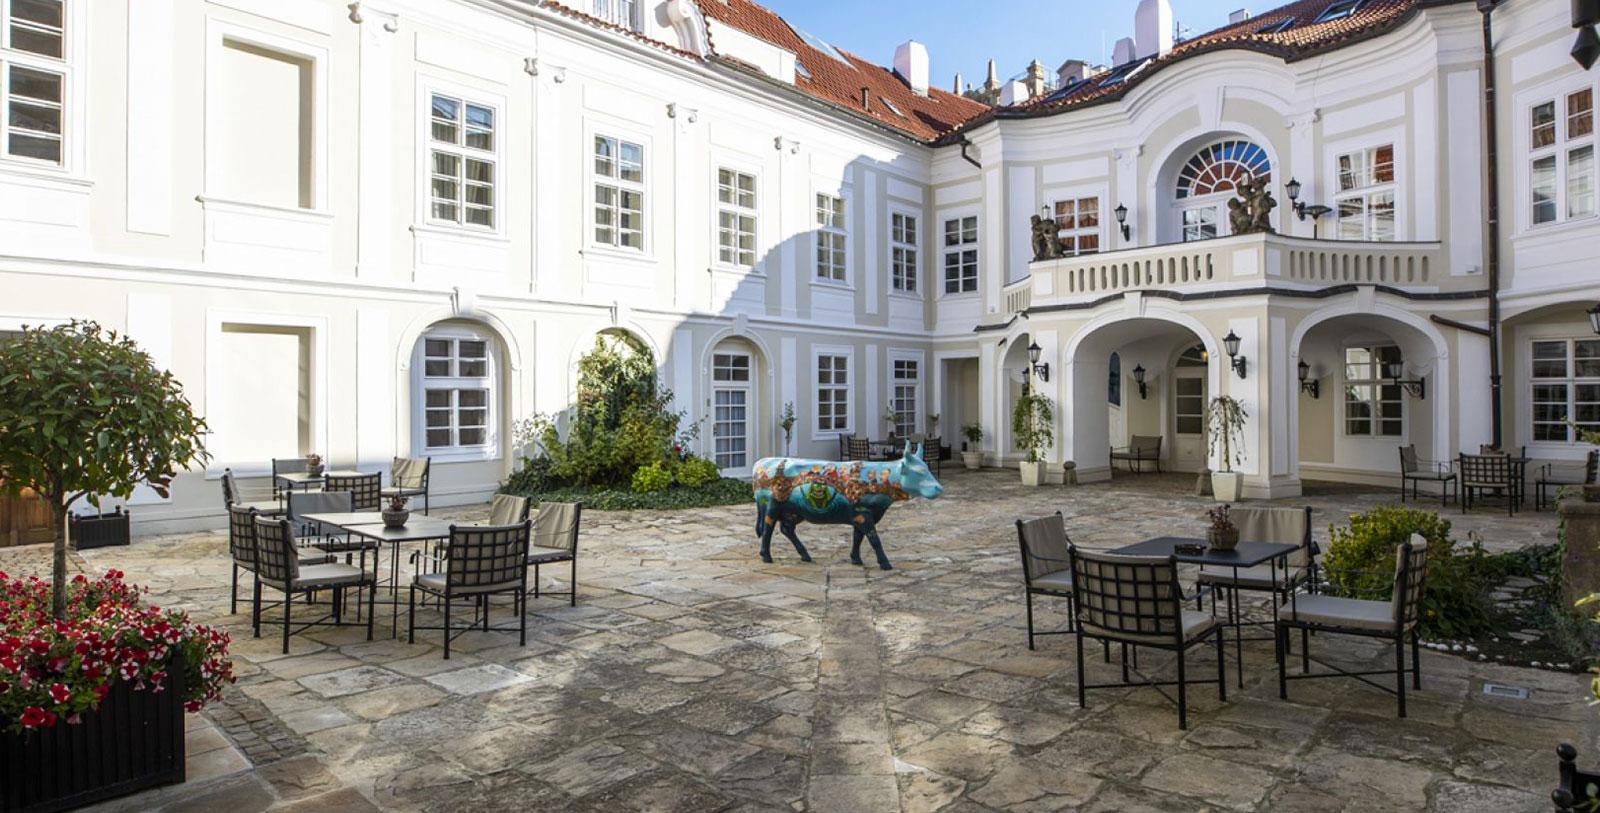 Image of Exterior, Smetana Hotel, 1770, Member of Historic Hotels Worldwide, Prague, Czech Republic